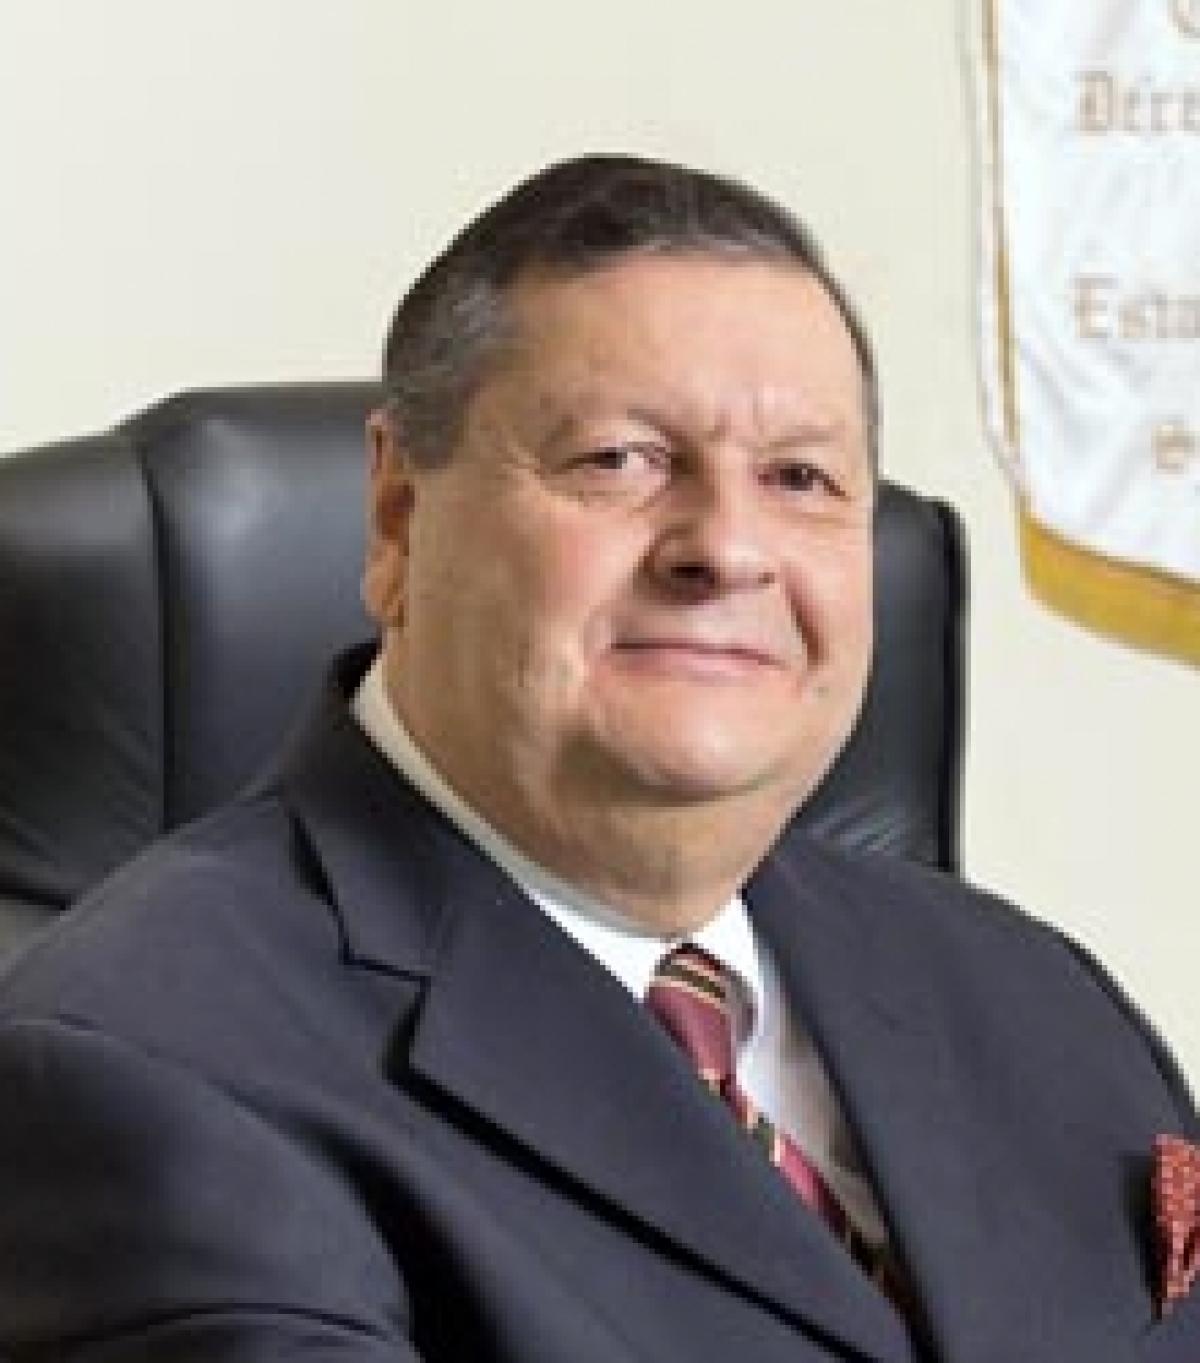 Rechazan  ratificar a Diez de Urdanivia en CDHEC